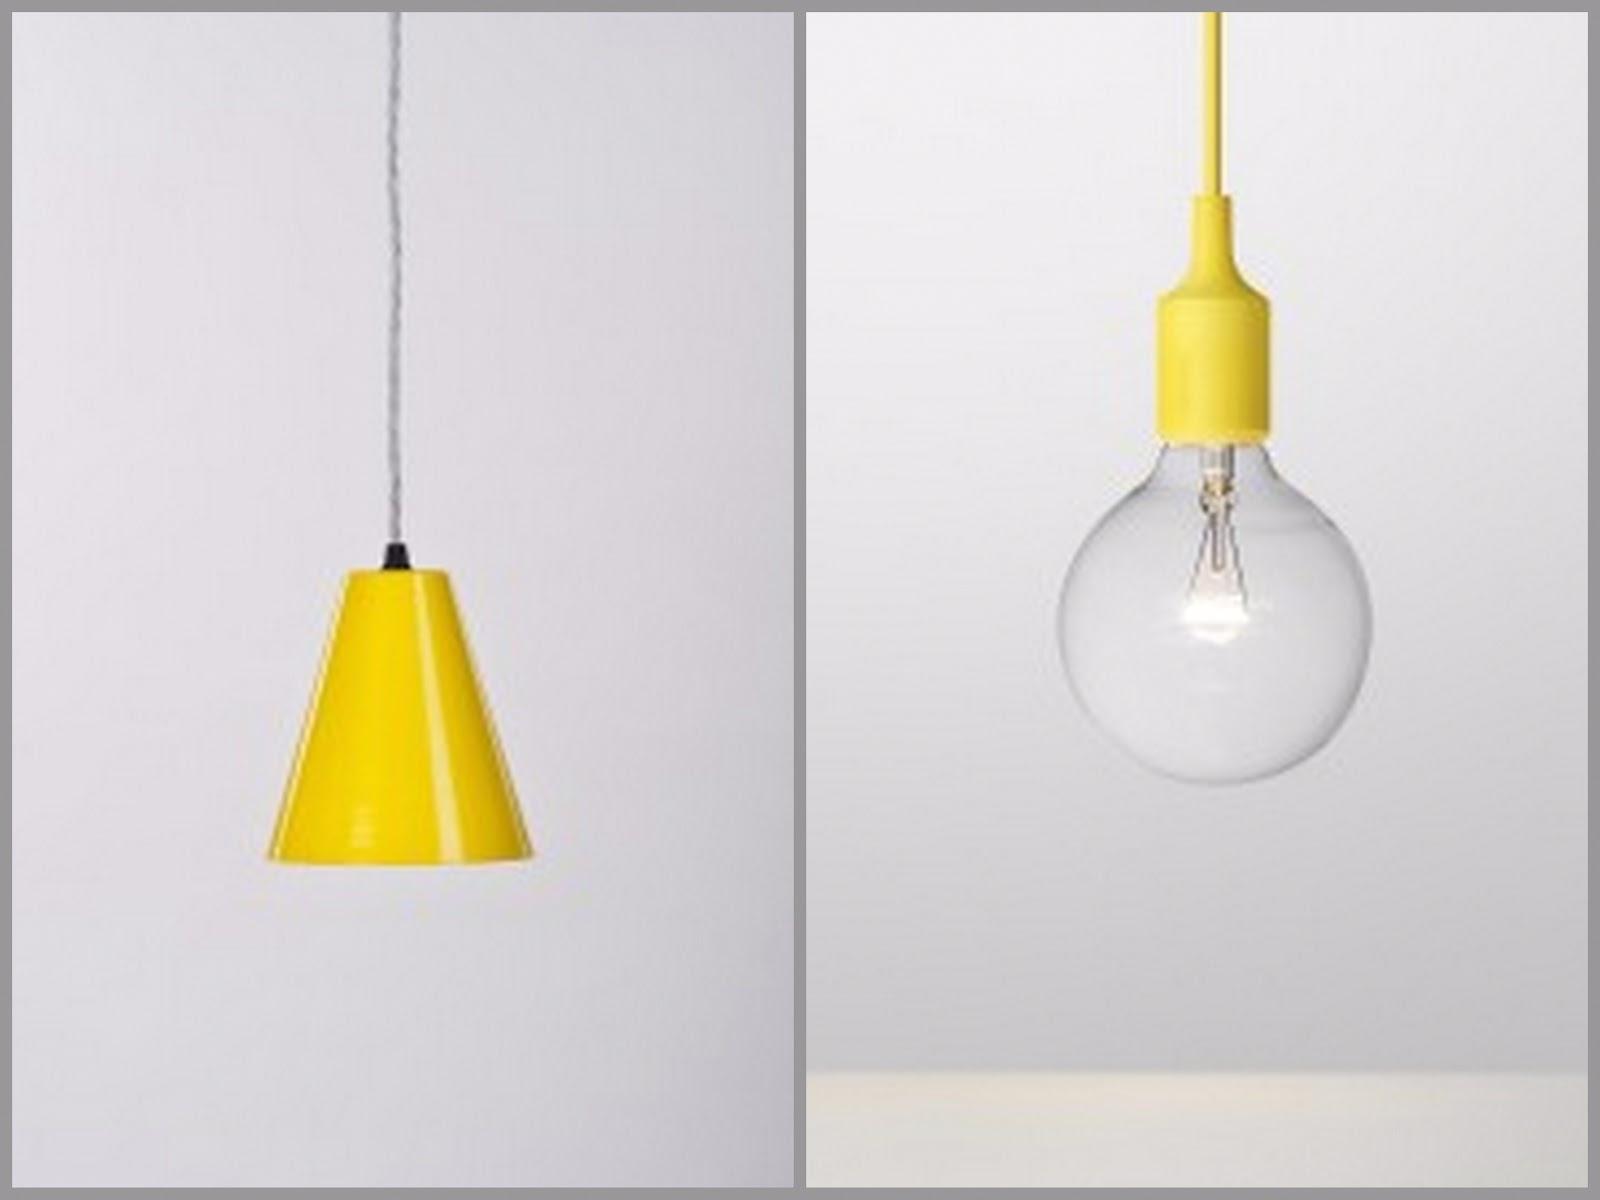 Yellow U0027Triangleu0027 Pendant Light By By Workroom Design And Yellow E27 Pendant  Light By Mattias Ståhlbom For Muuto